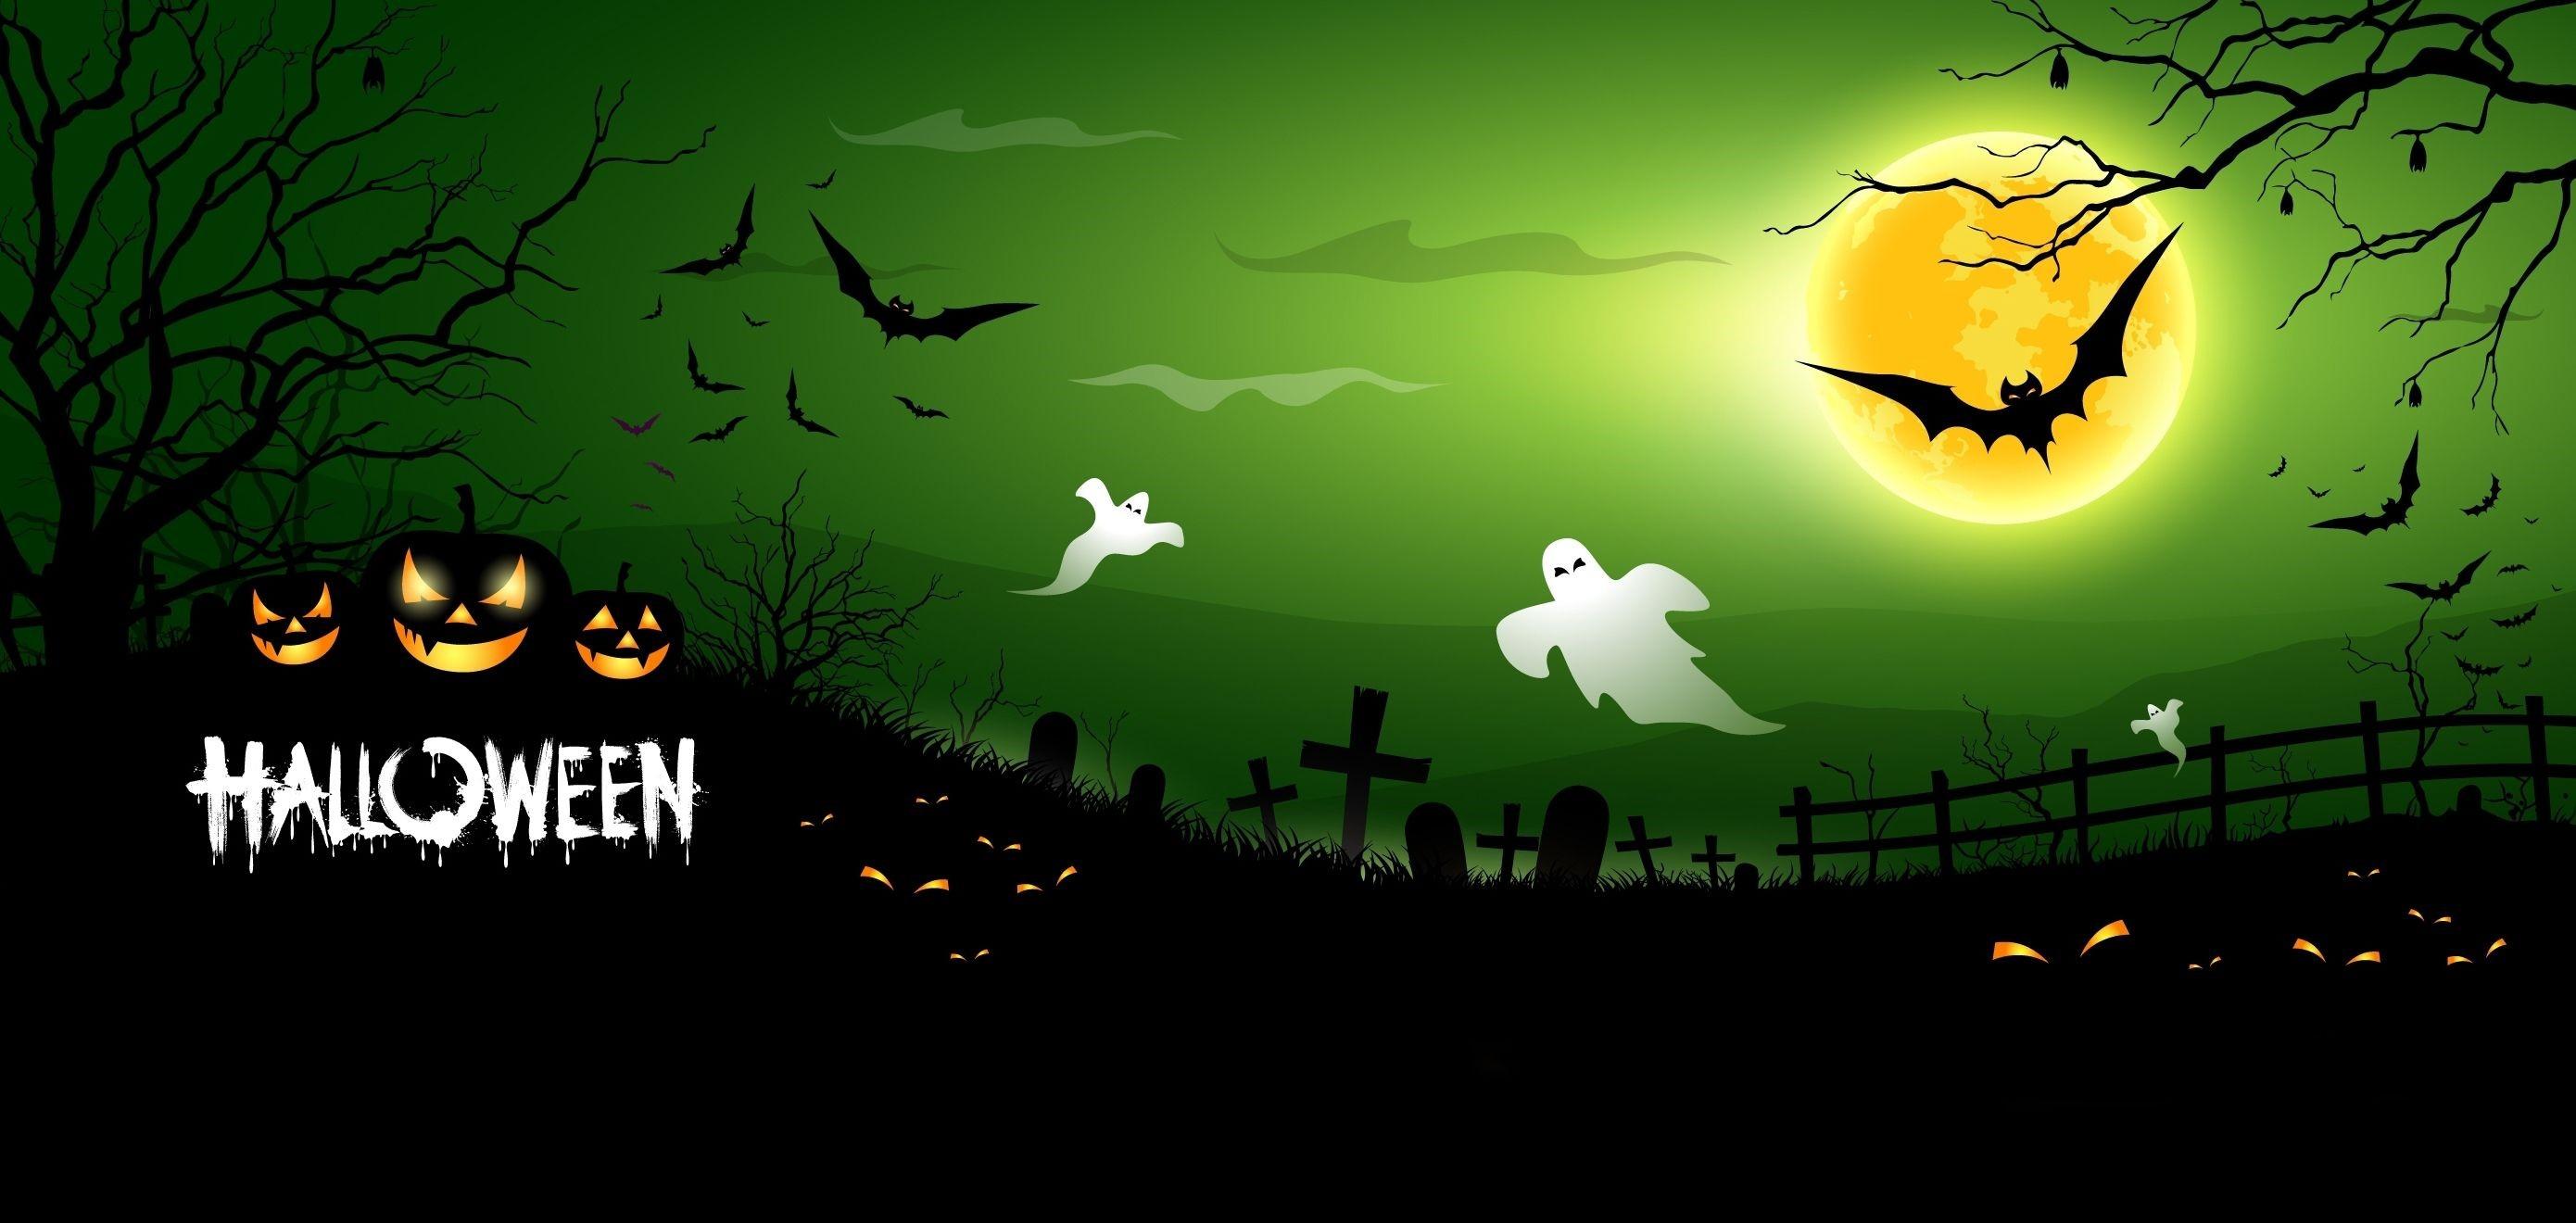 Halloween Cover Photo Wallpaper